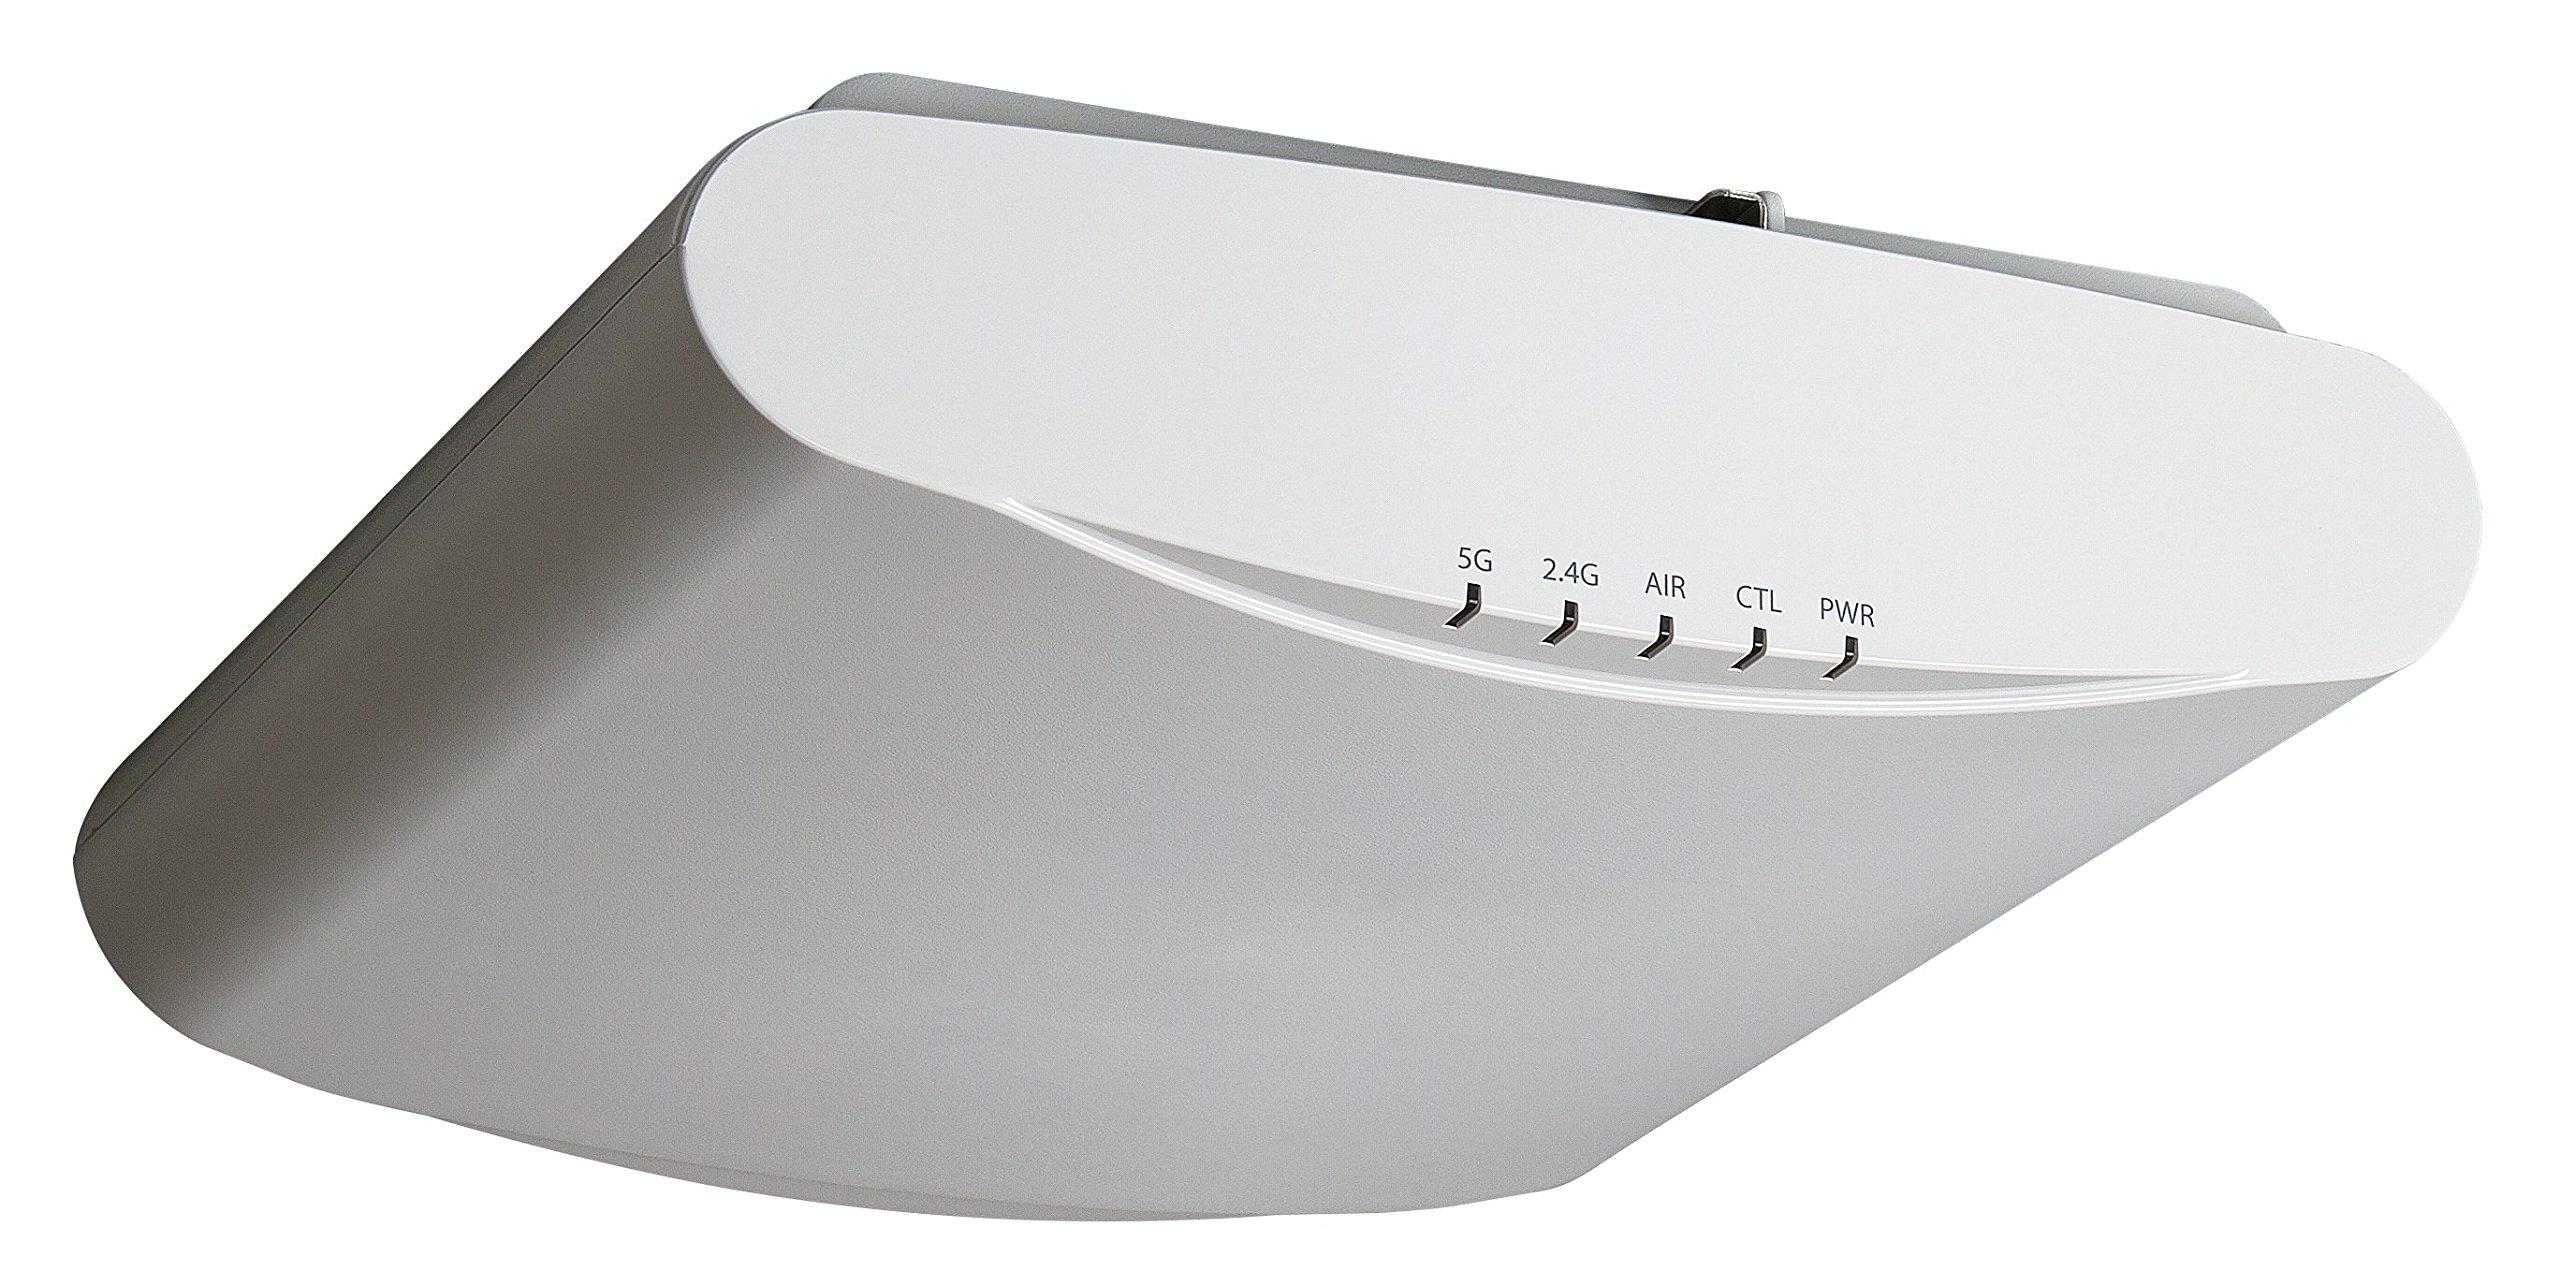 Ruckus Wireless ZoneFlex R720 Indoor Access Point 901-R720-US00 (4x4 MU-MIMO, 802.11ac Wave 2, Dual-Band Radios 2.4GHz/5GHz, Beamflex, POE)